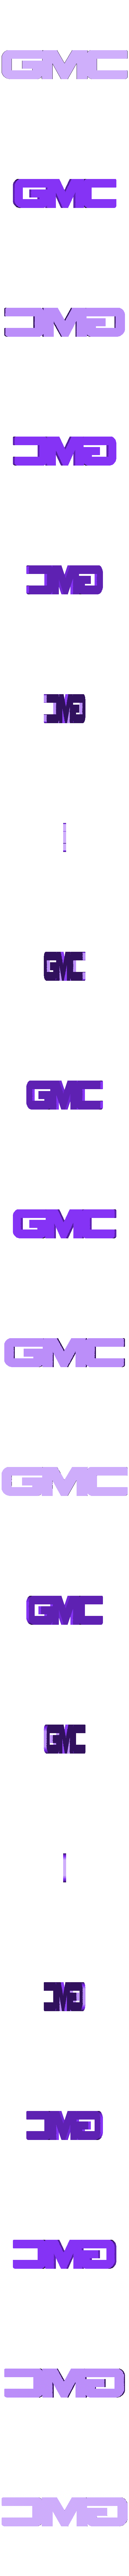 GMC.stl Download free STL file GMC logo • 3D print model, MakeItWork